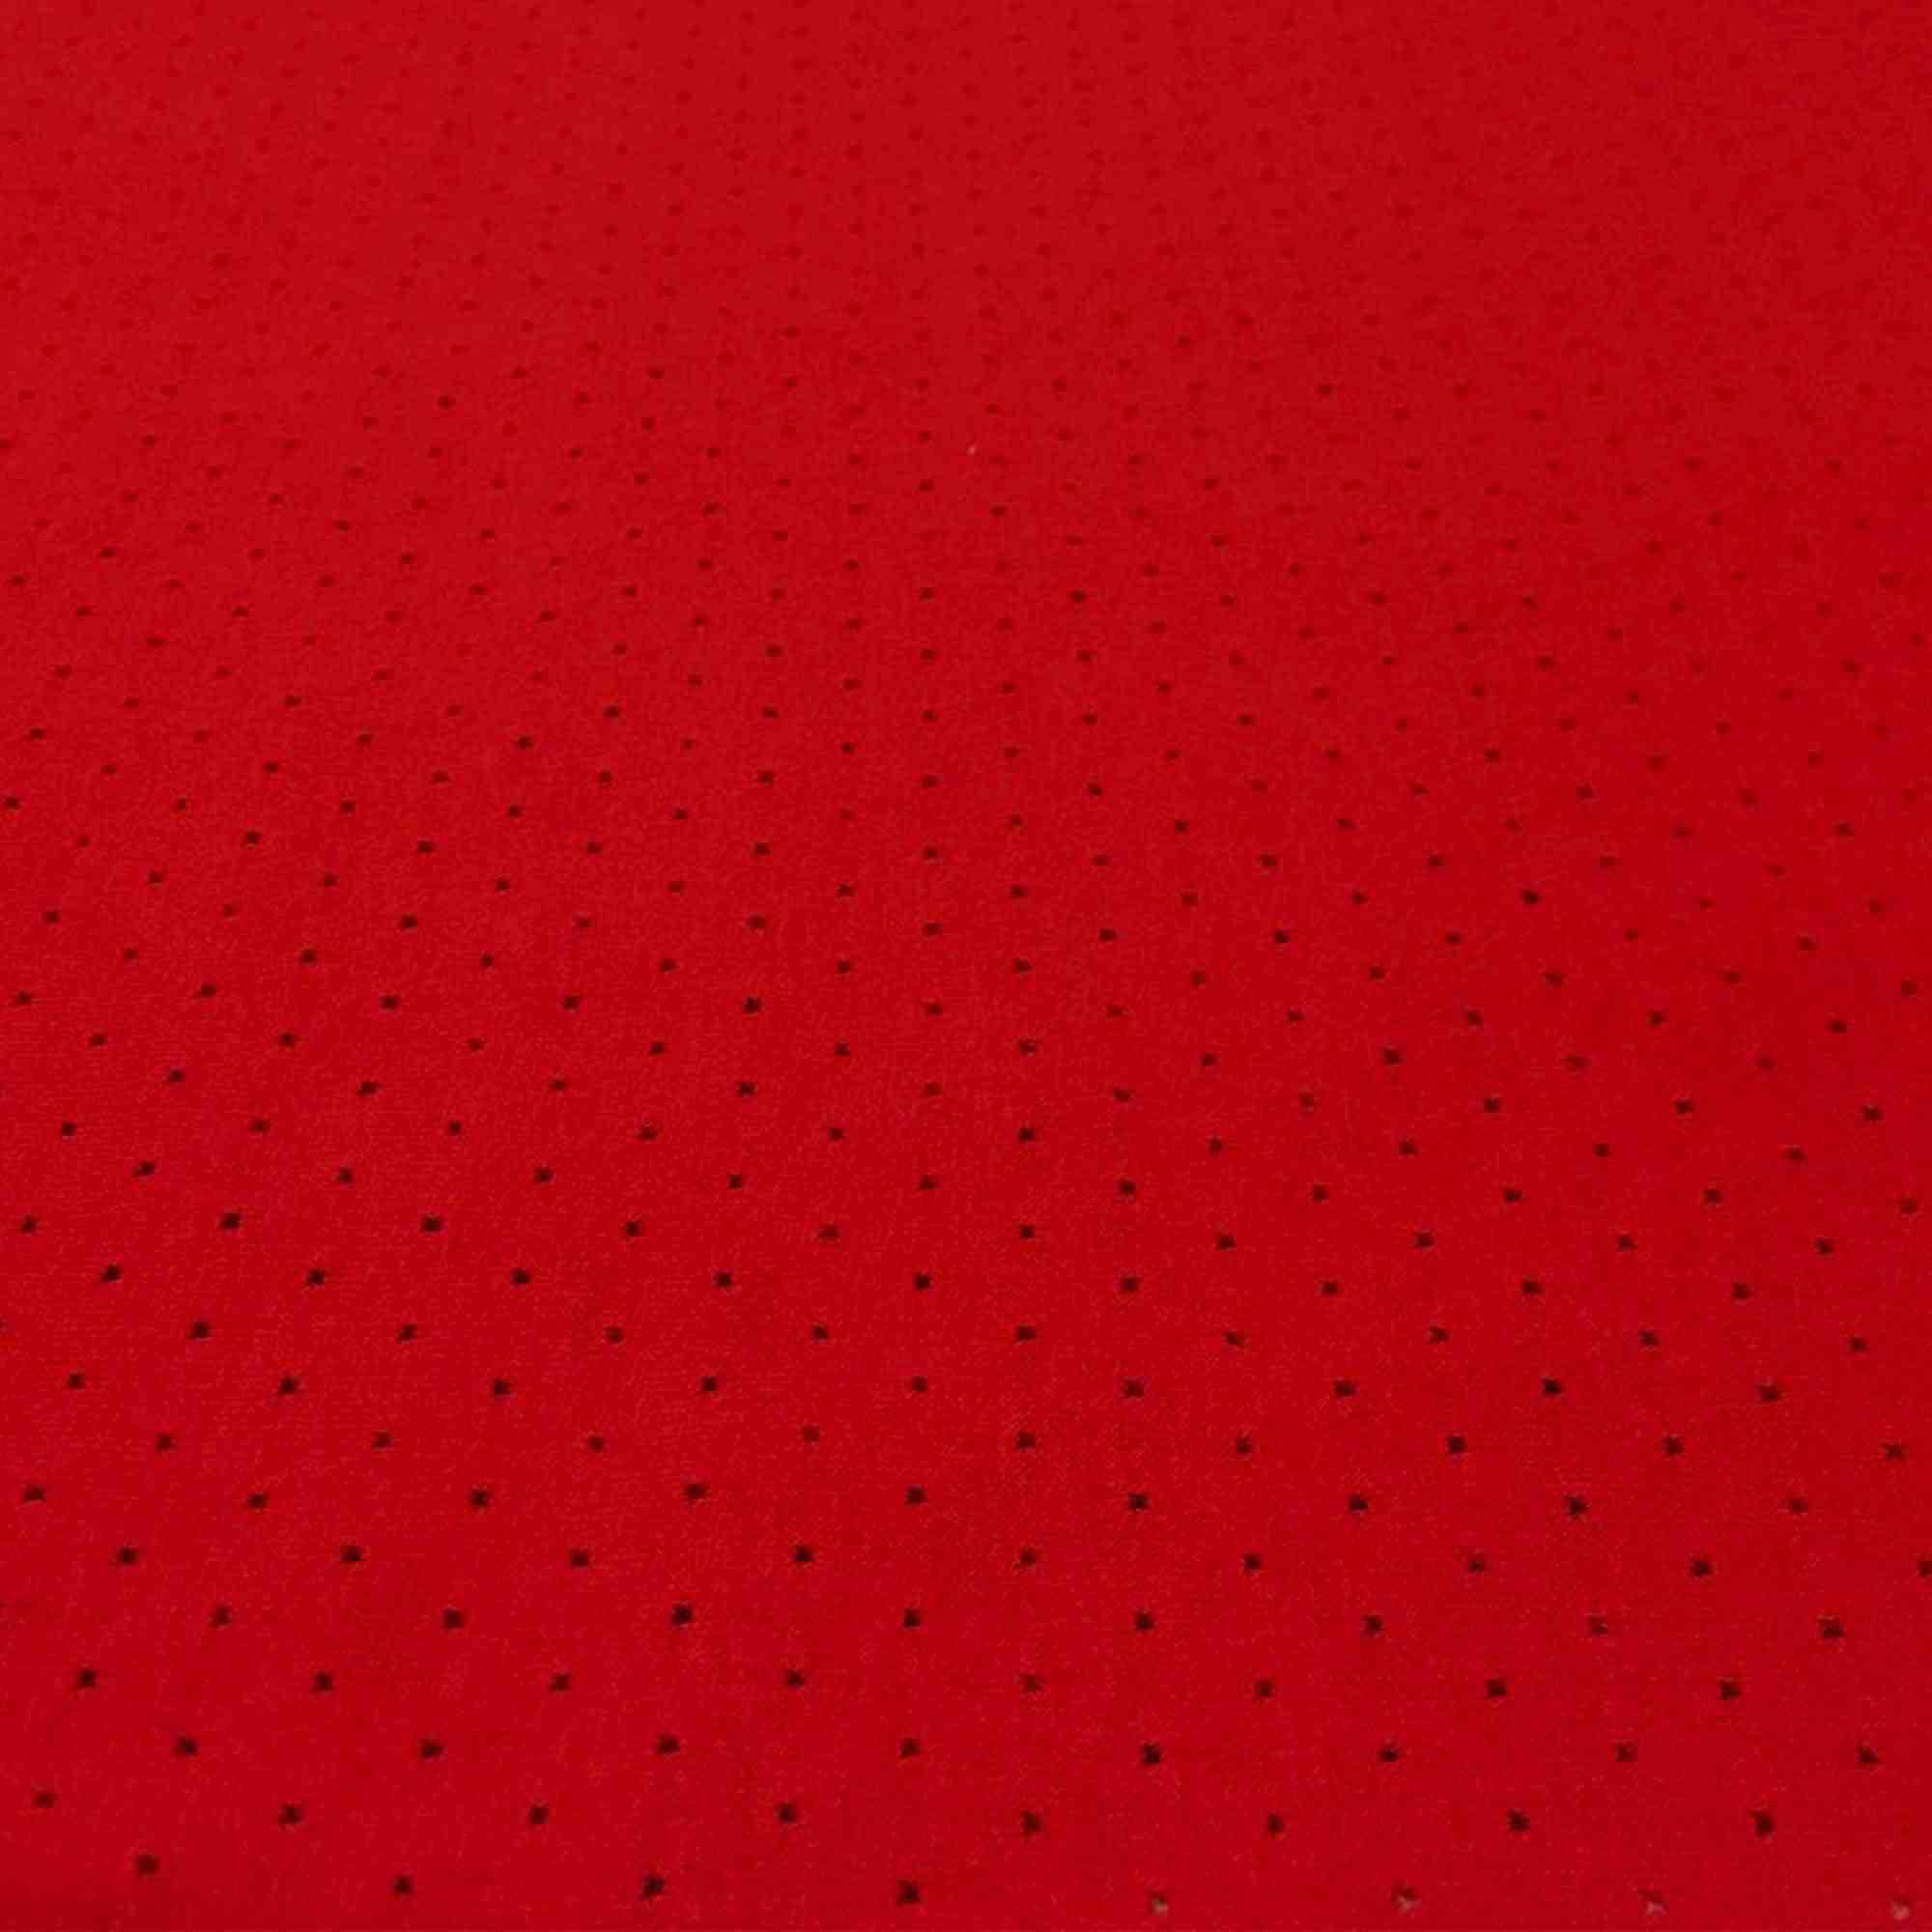 Viscosport Vermelho